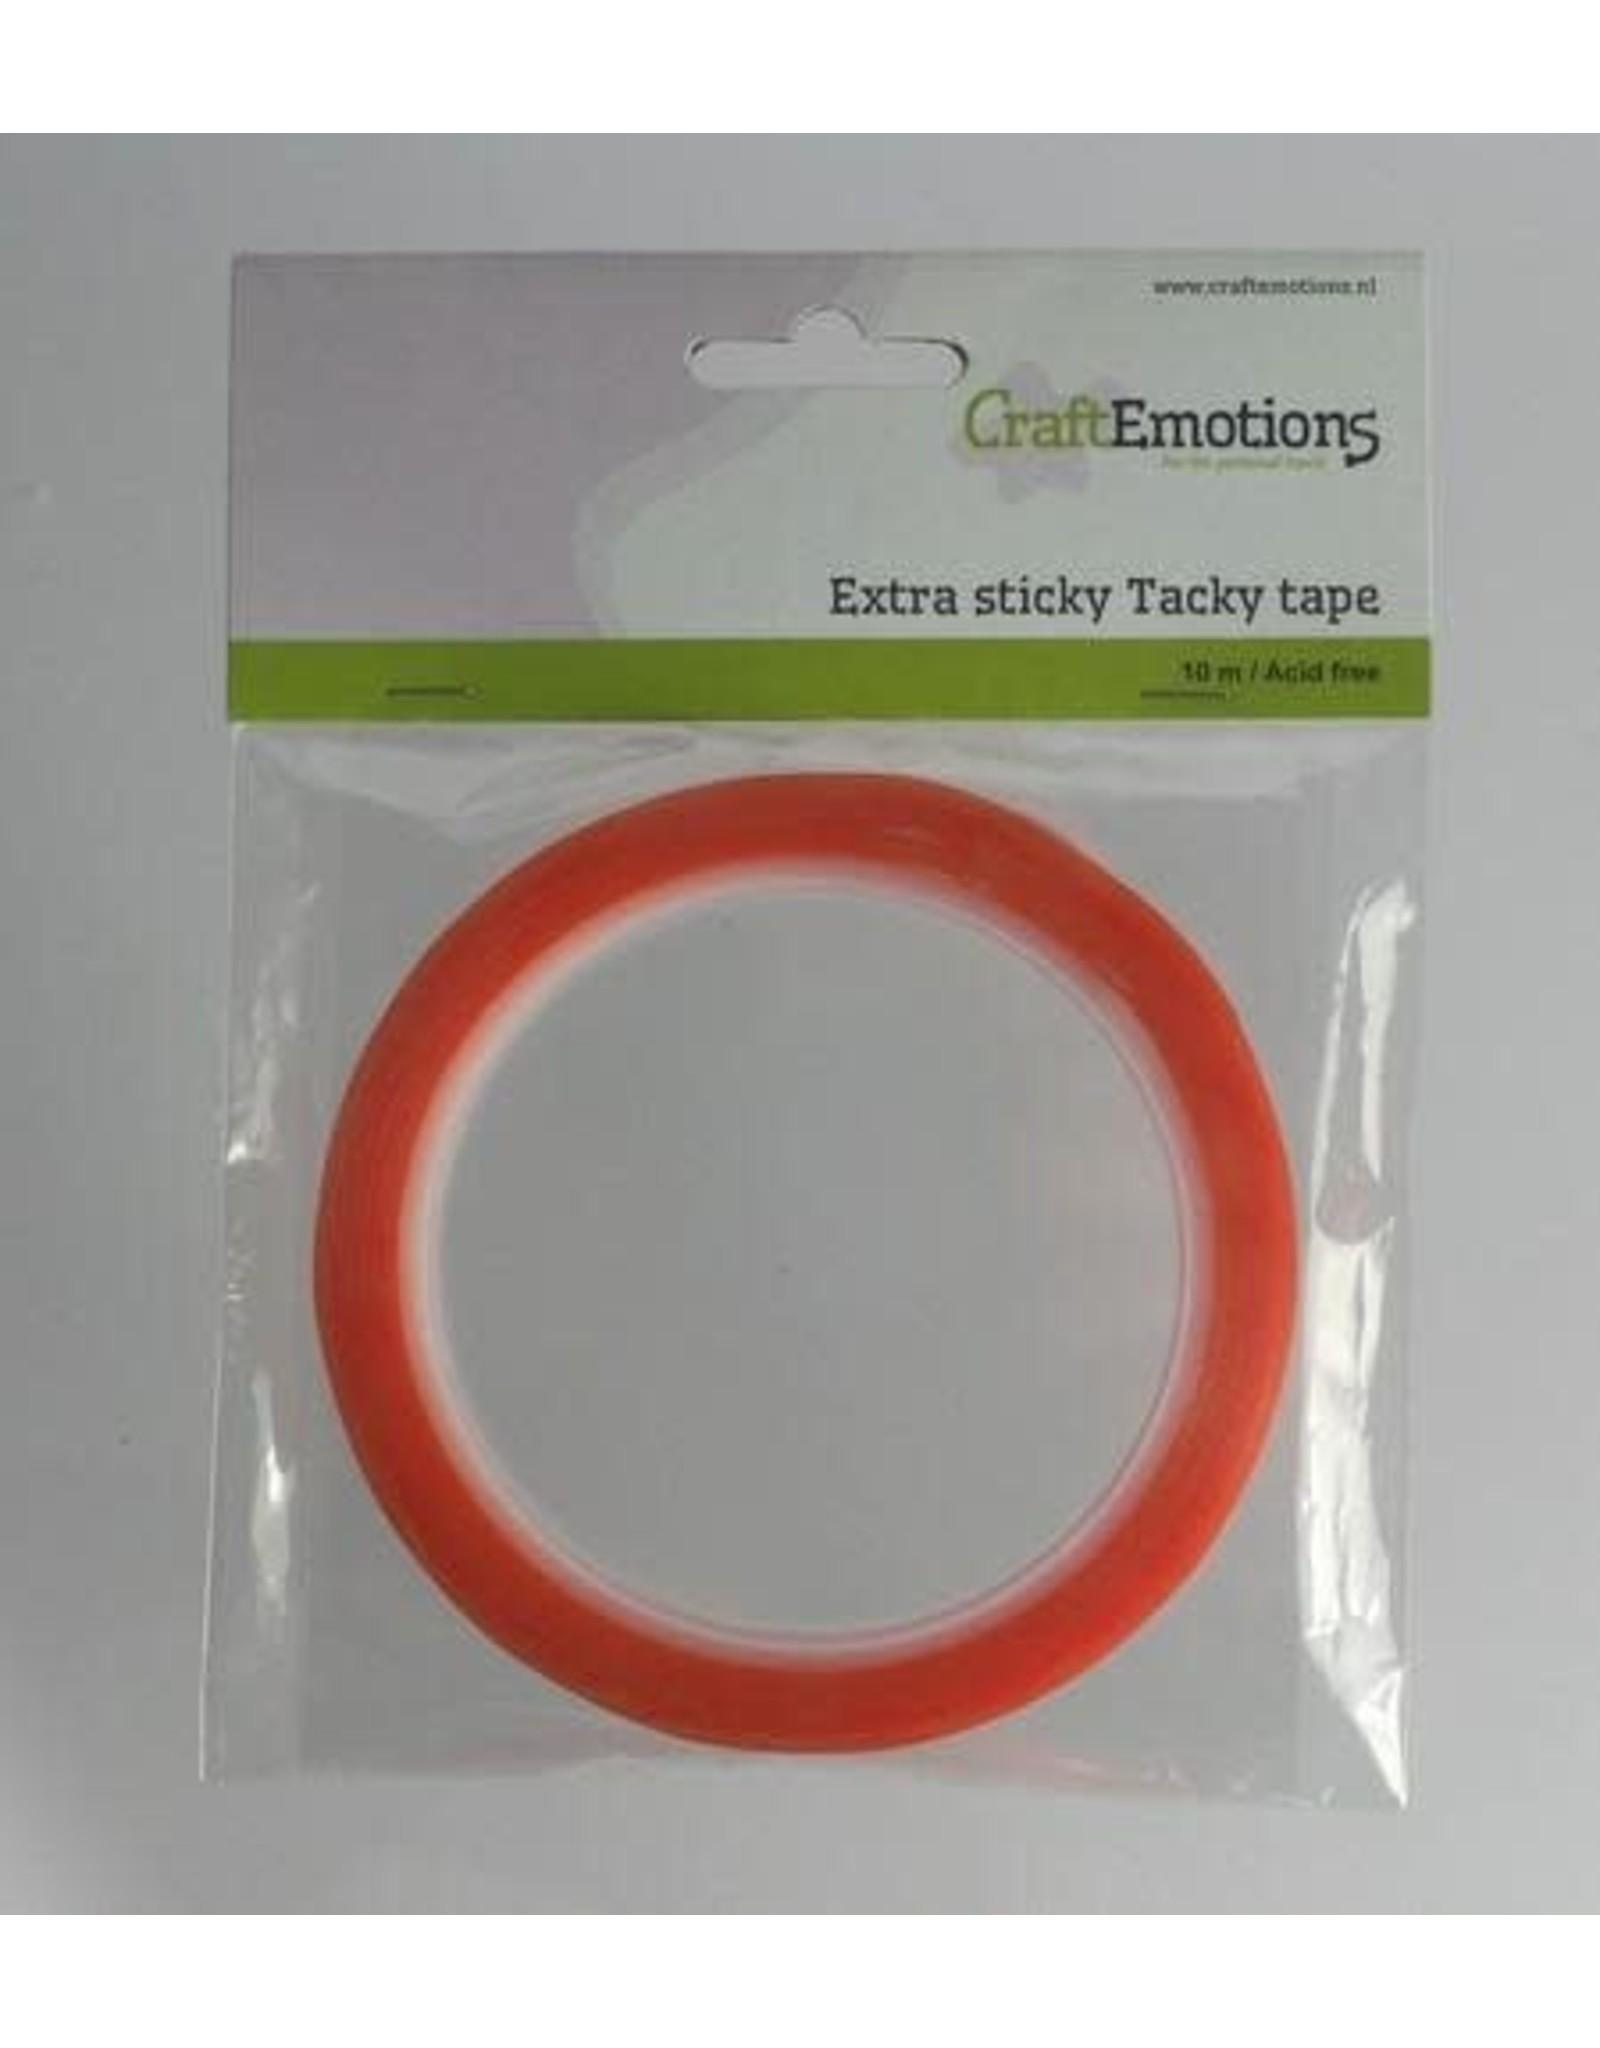 Craft Emotions CraftEmotions Extra sticky tape 6 mm 10 MT 1 RL